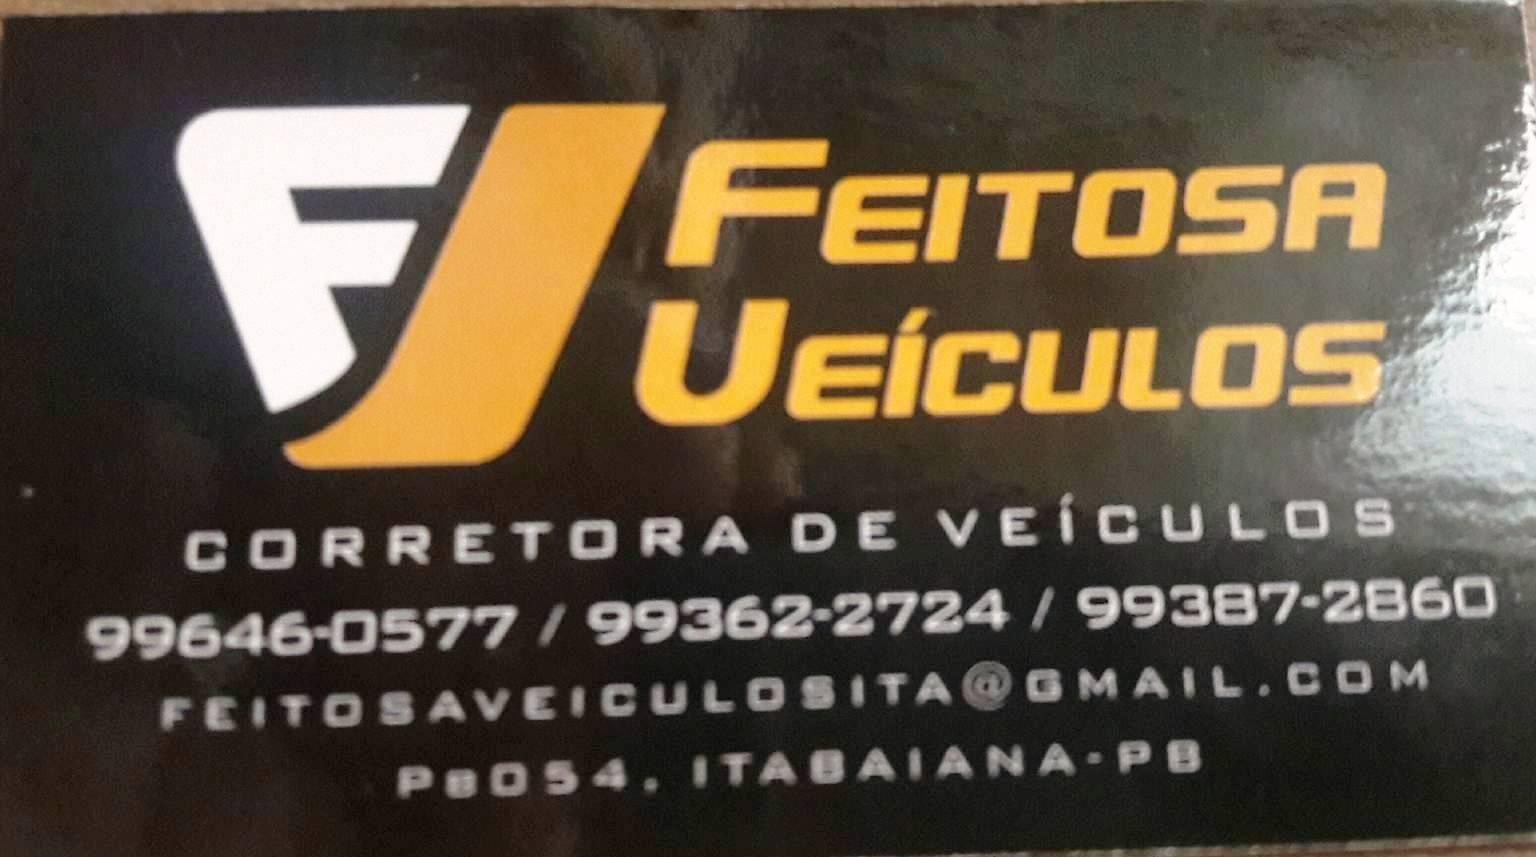 FEITOSA VEICULOS